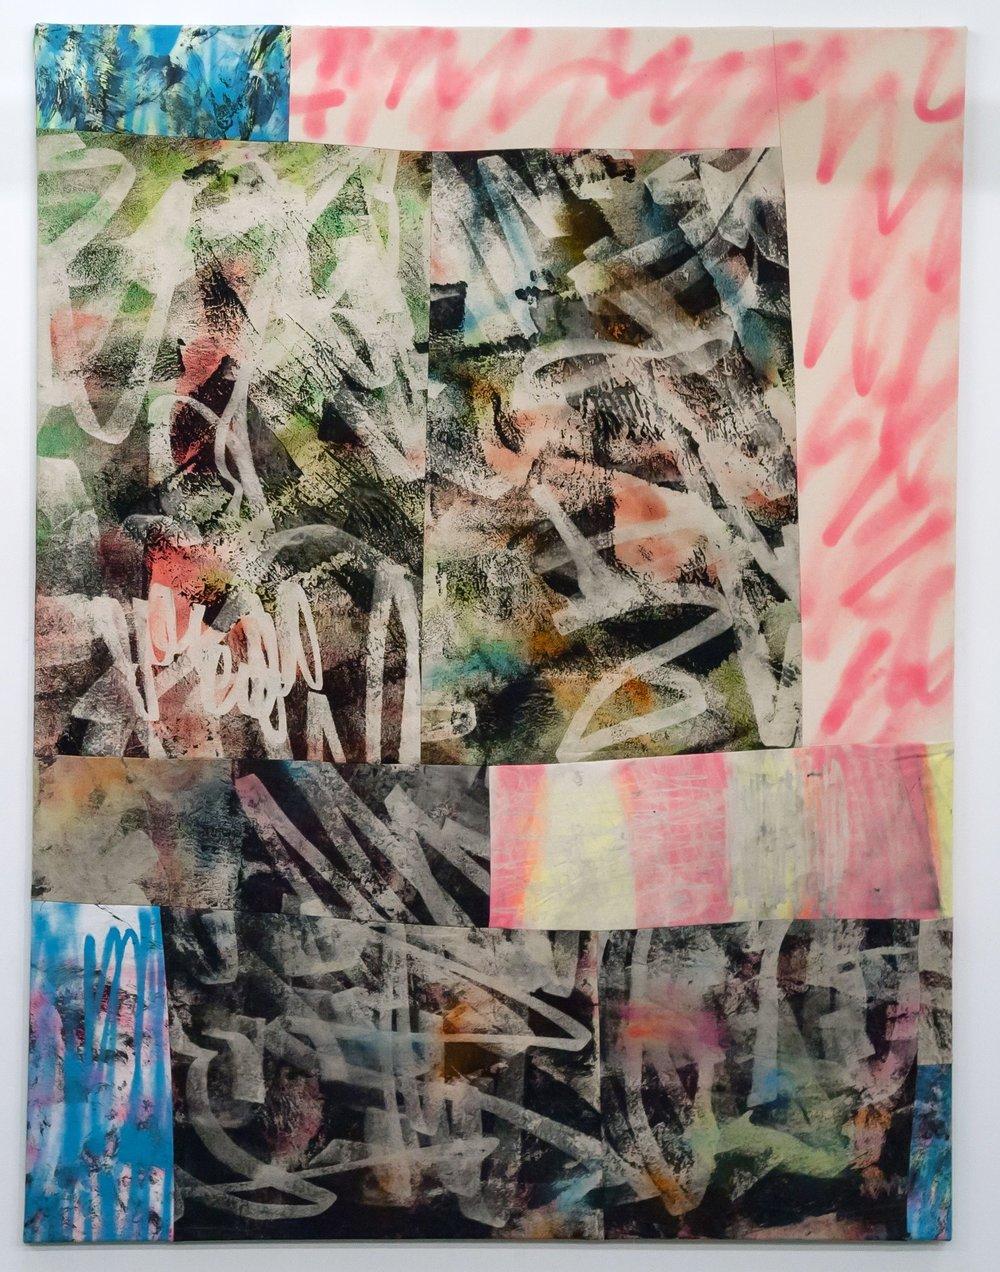 THE ENDLESS STORM, spray paint and acrylic on sewn canvas, 129 x 170 cm, 2017.jpg